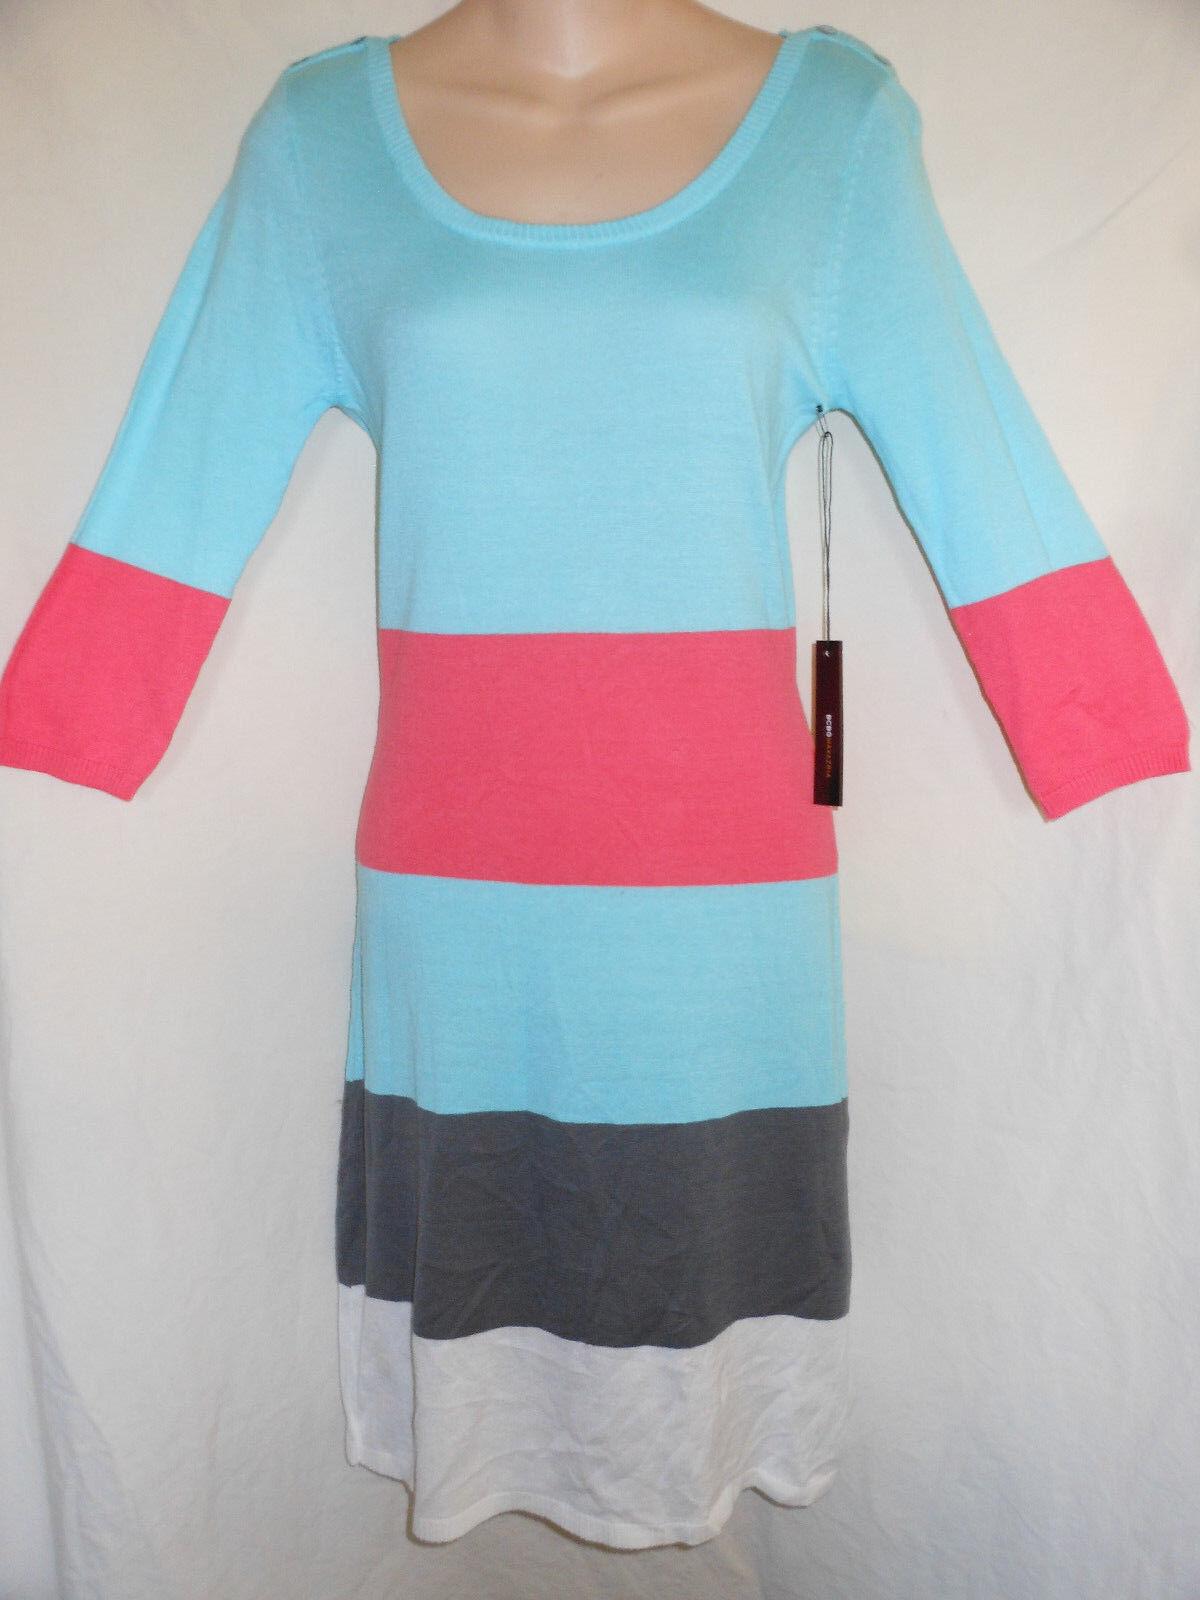 BCBG Maxazria S NWT 160  Crystal bluee Combo Striped Knit Sweater Dress BC32565D